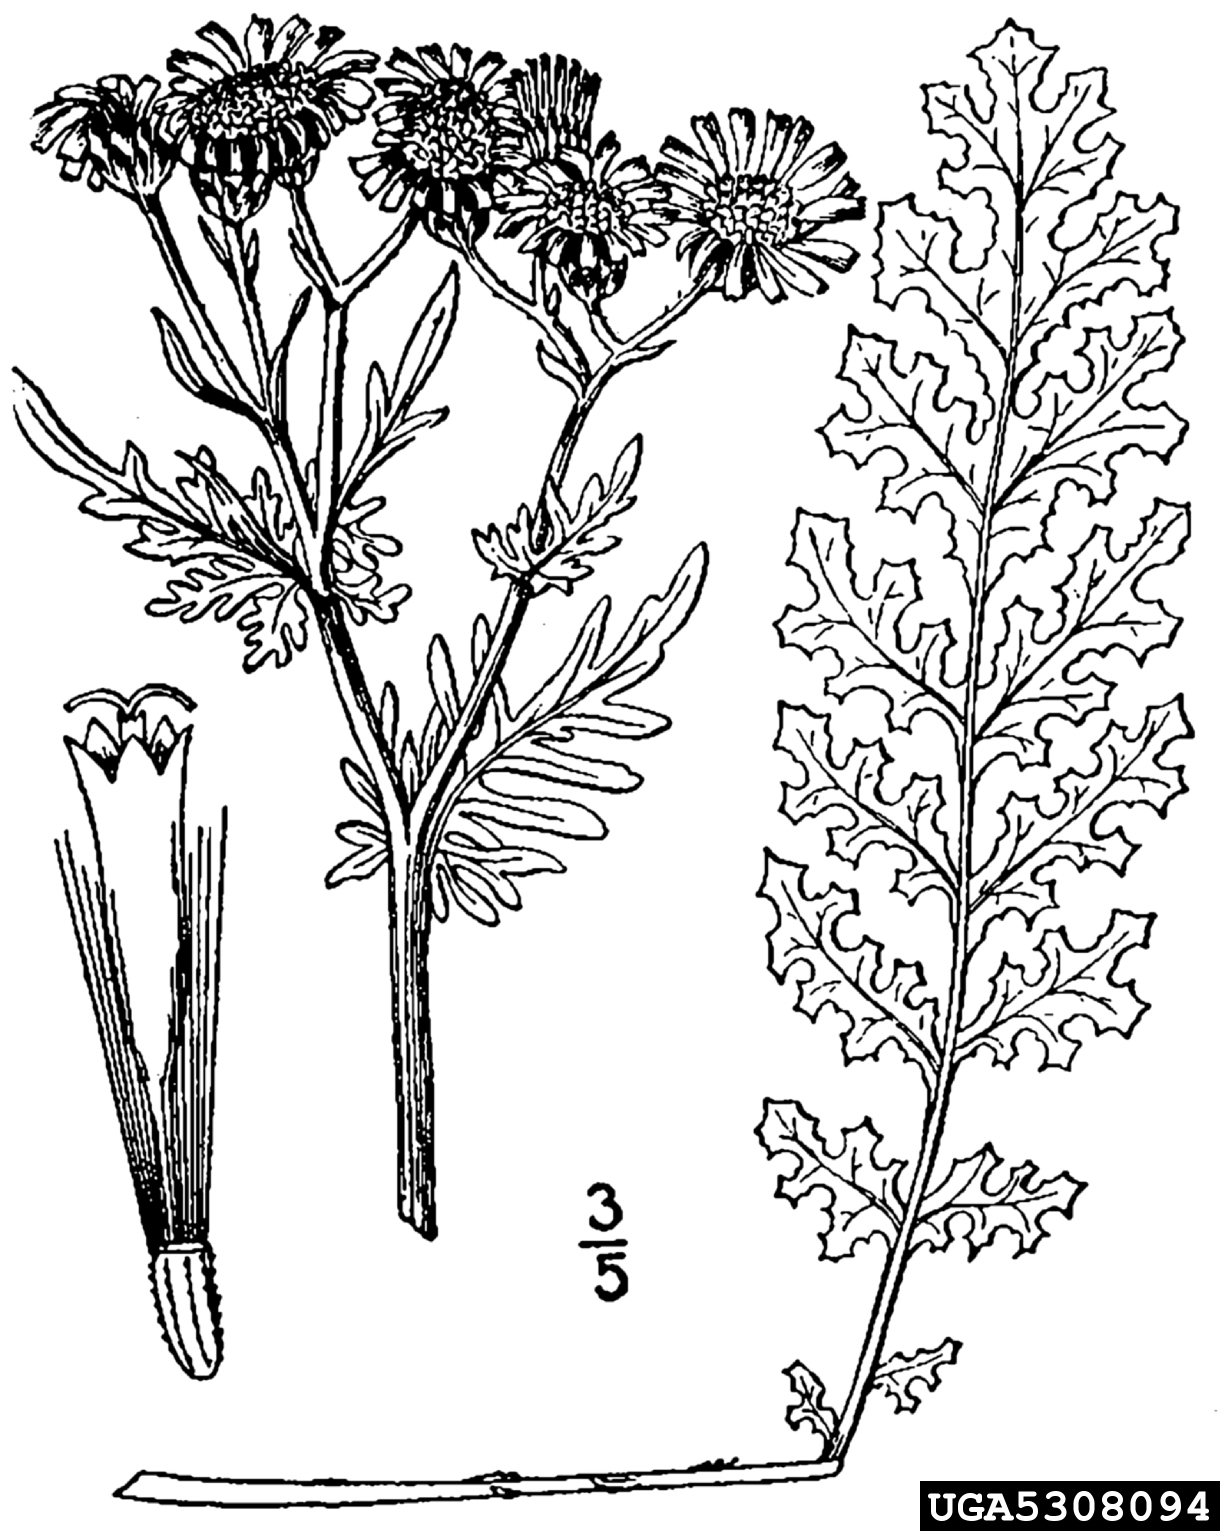 tansy ragwort: Senecio jacobaea (Asterales: Asteraceae)